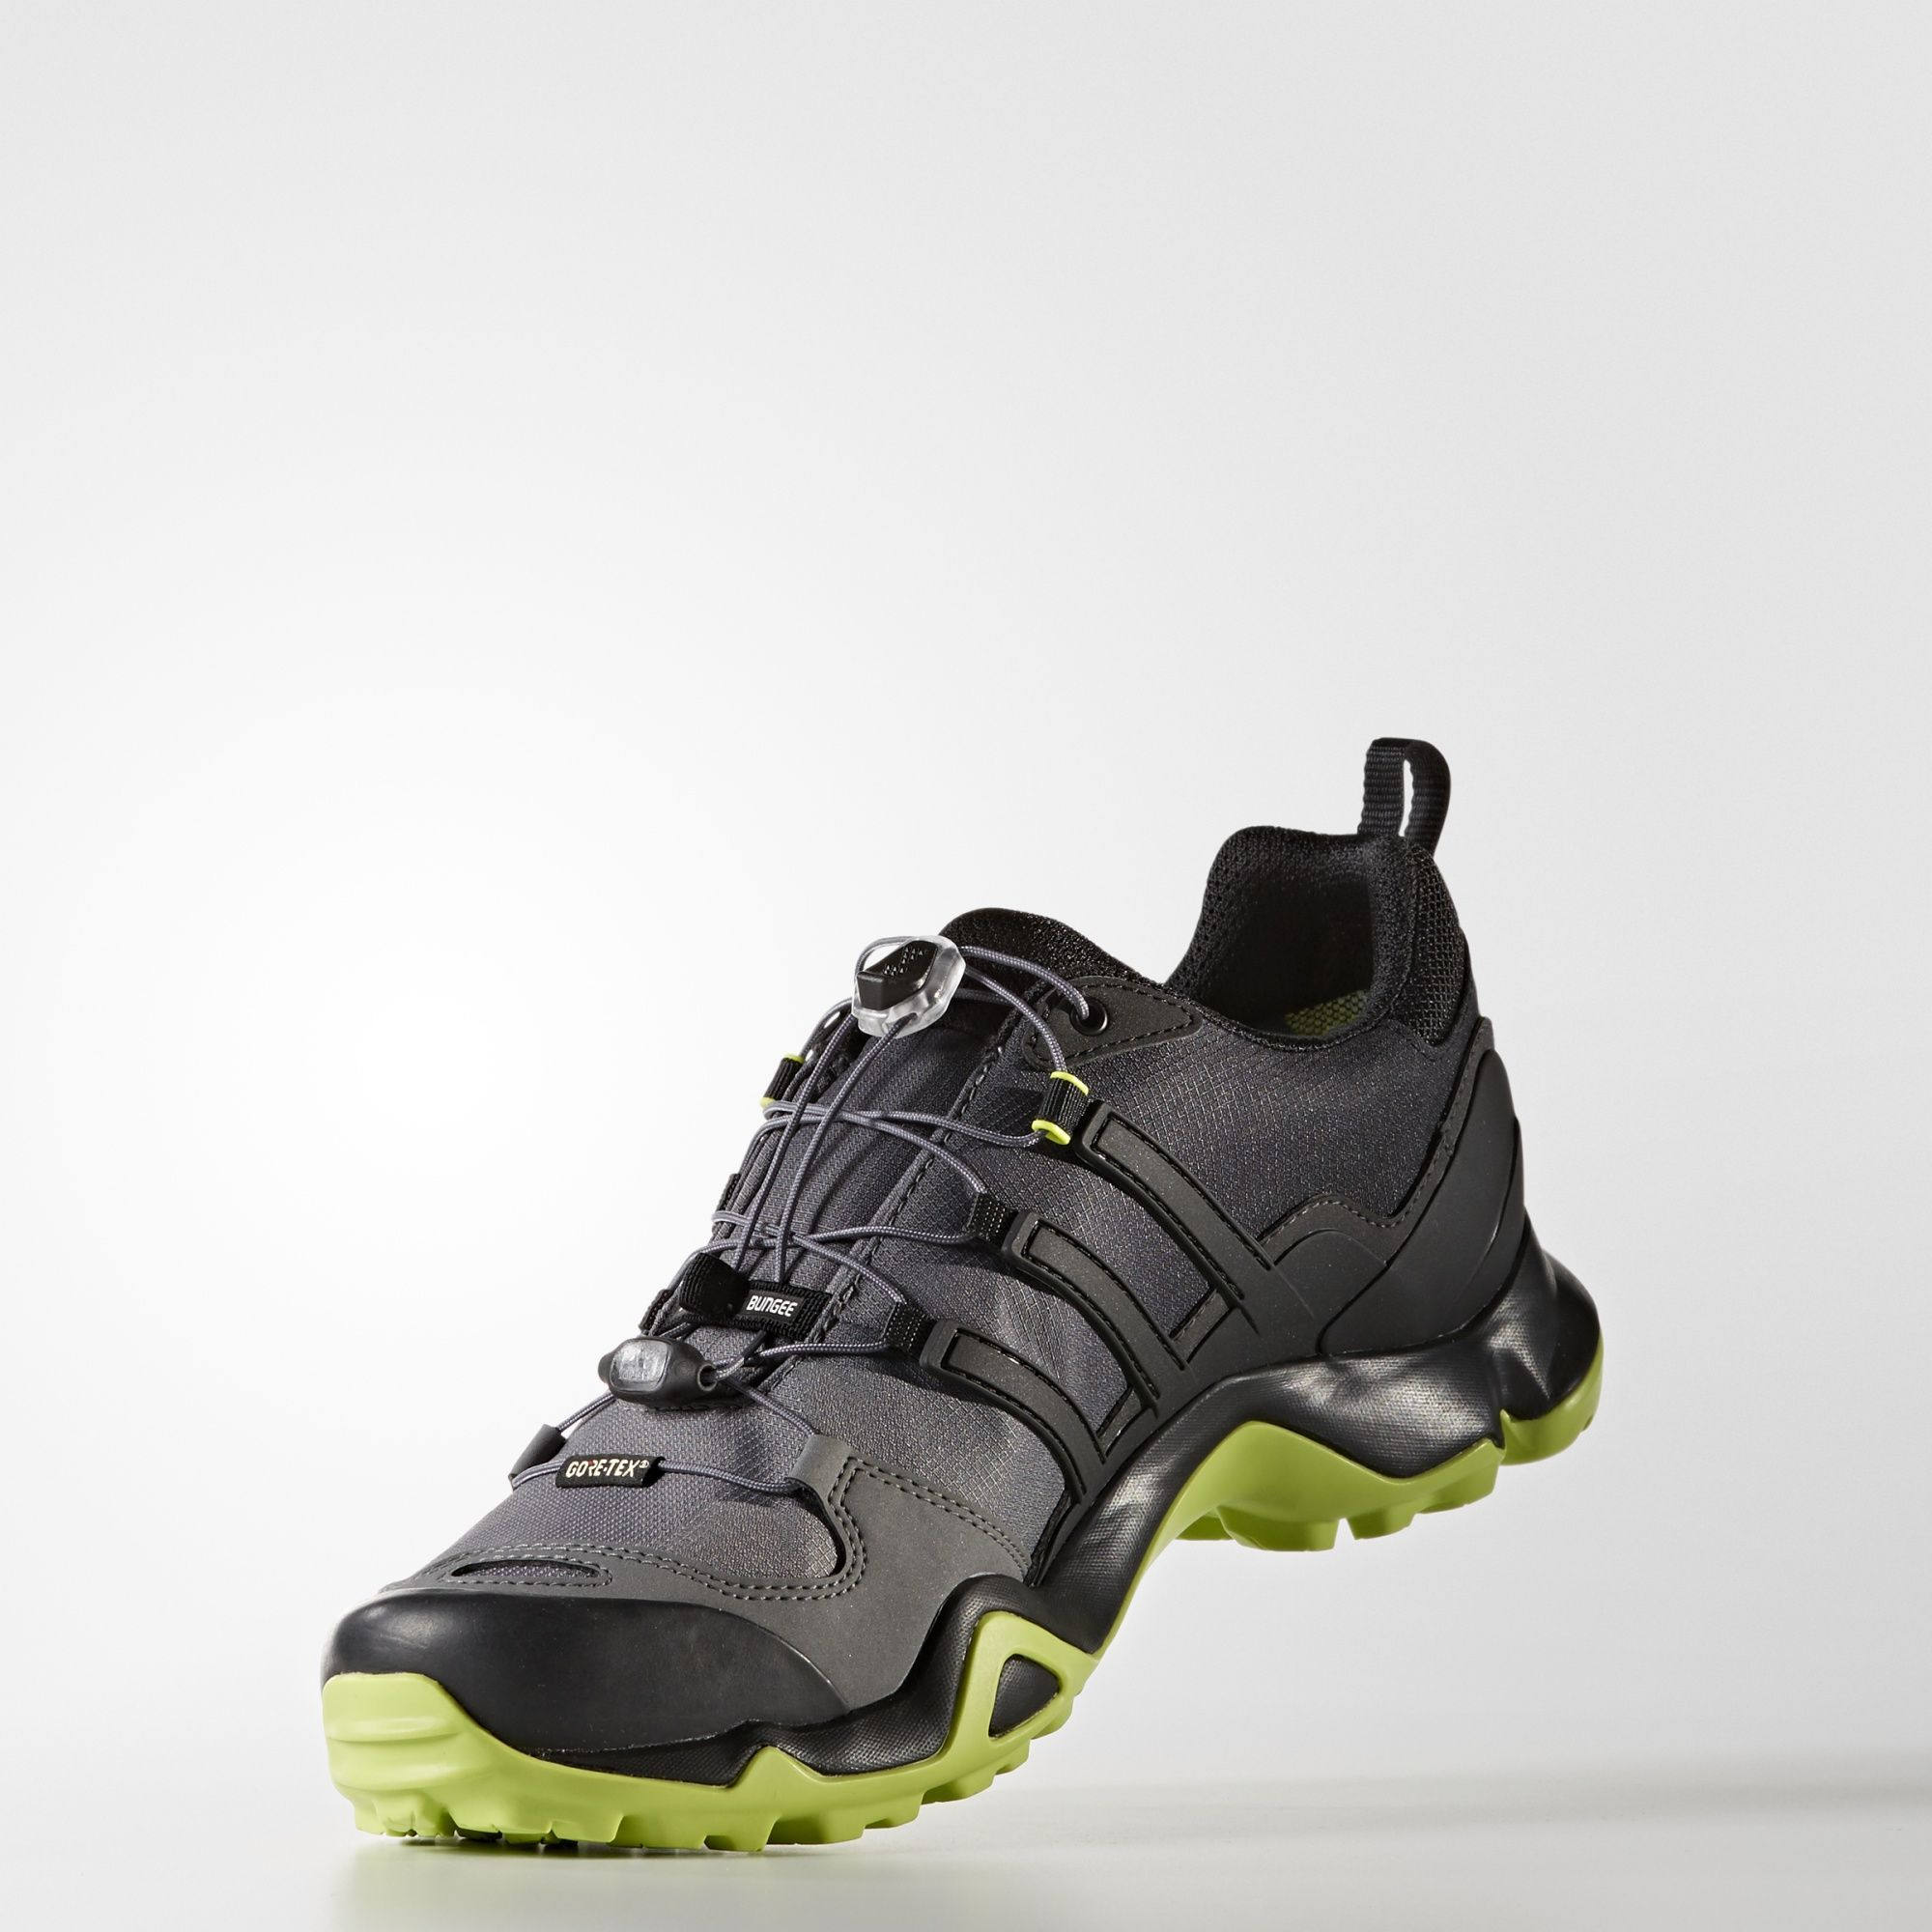 3e908b5a0 TERREX Swift R GTX Shoes in 2019